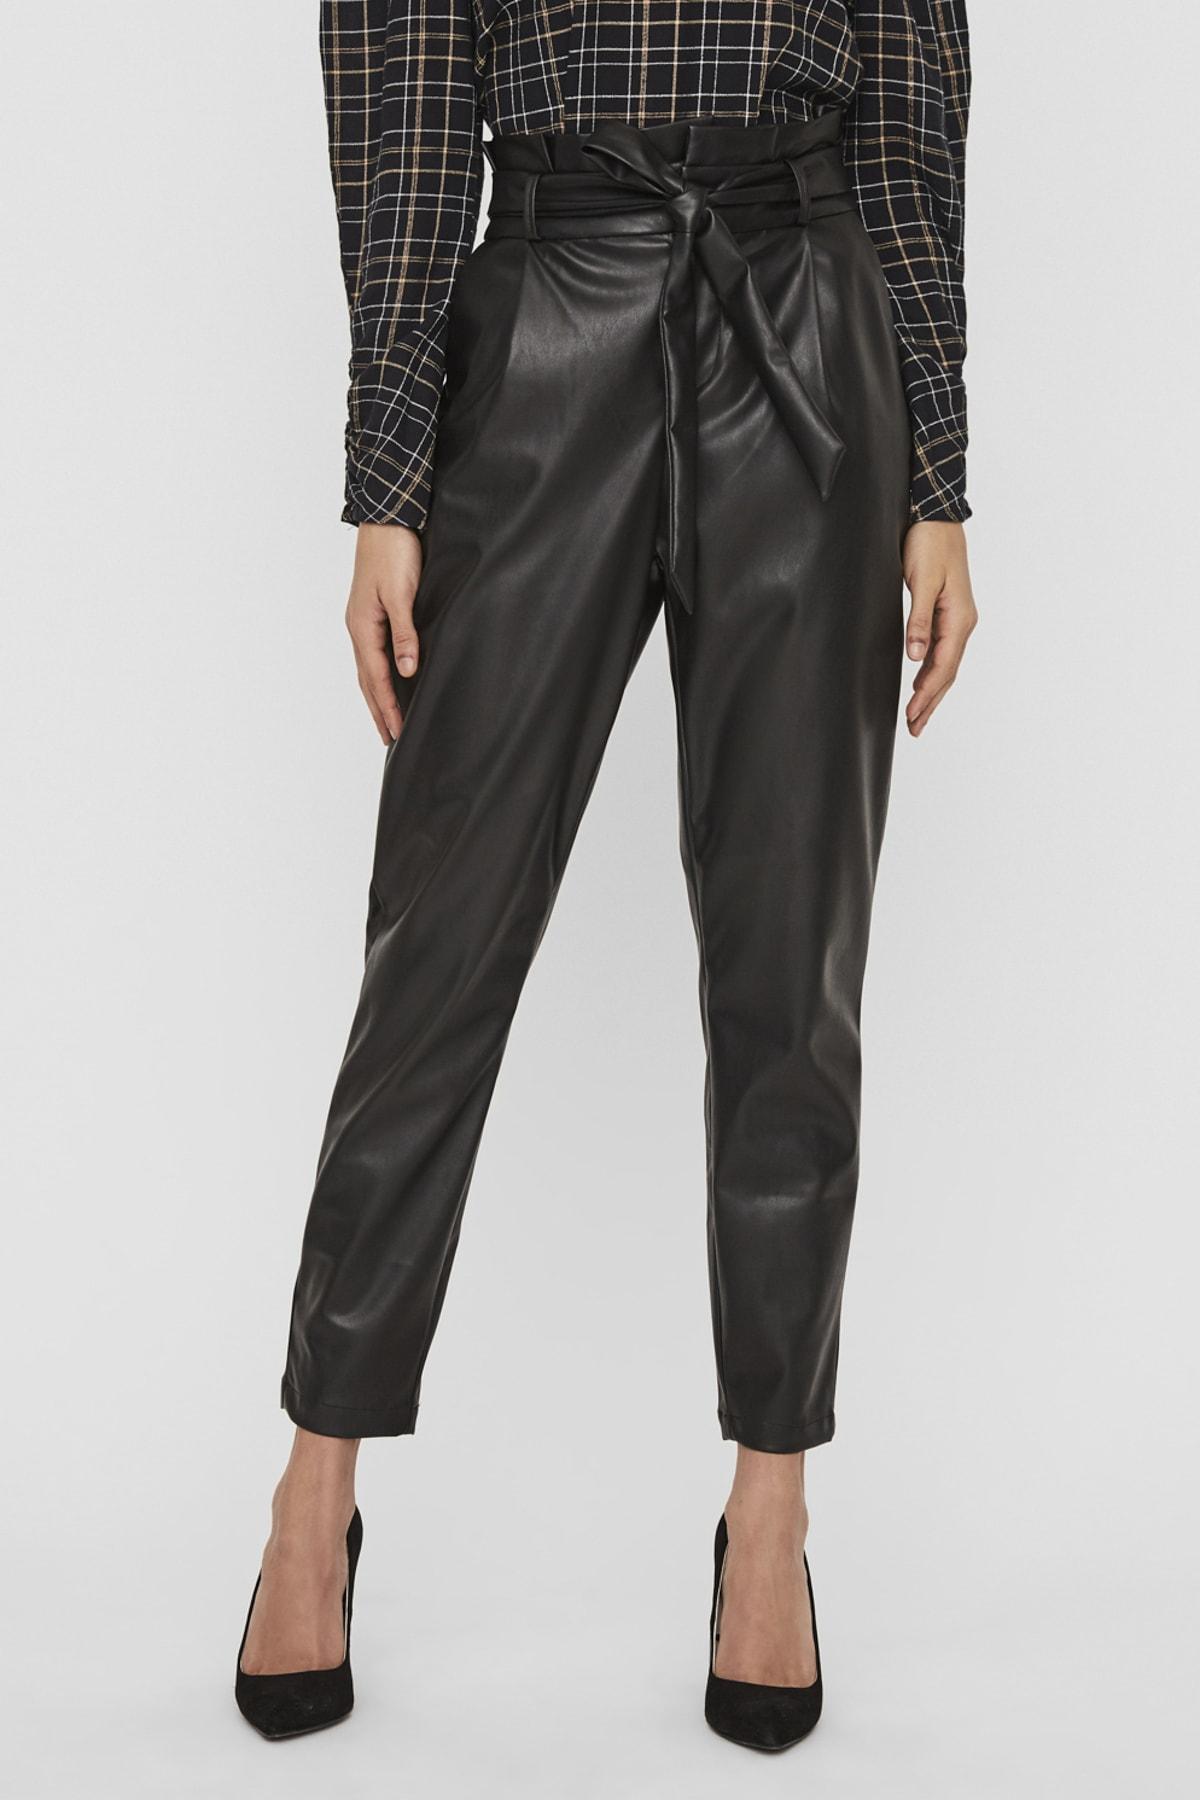 Vero Moda Kadın Siyah Paperbag Kaplama Deri Pantolon 10235819 VMEVA 2